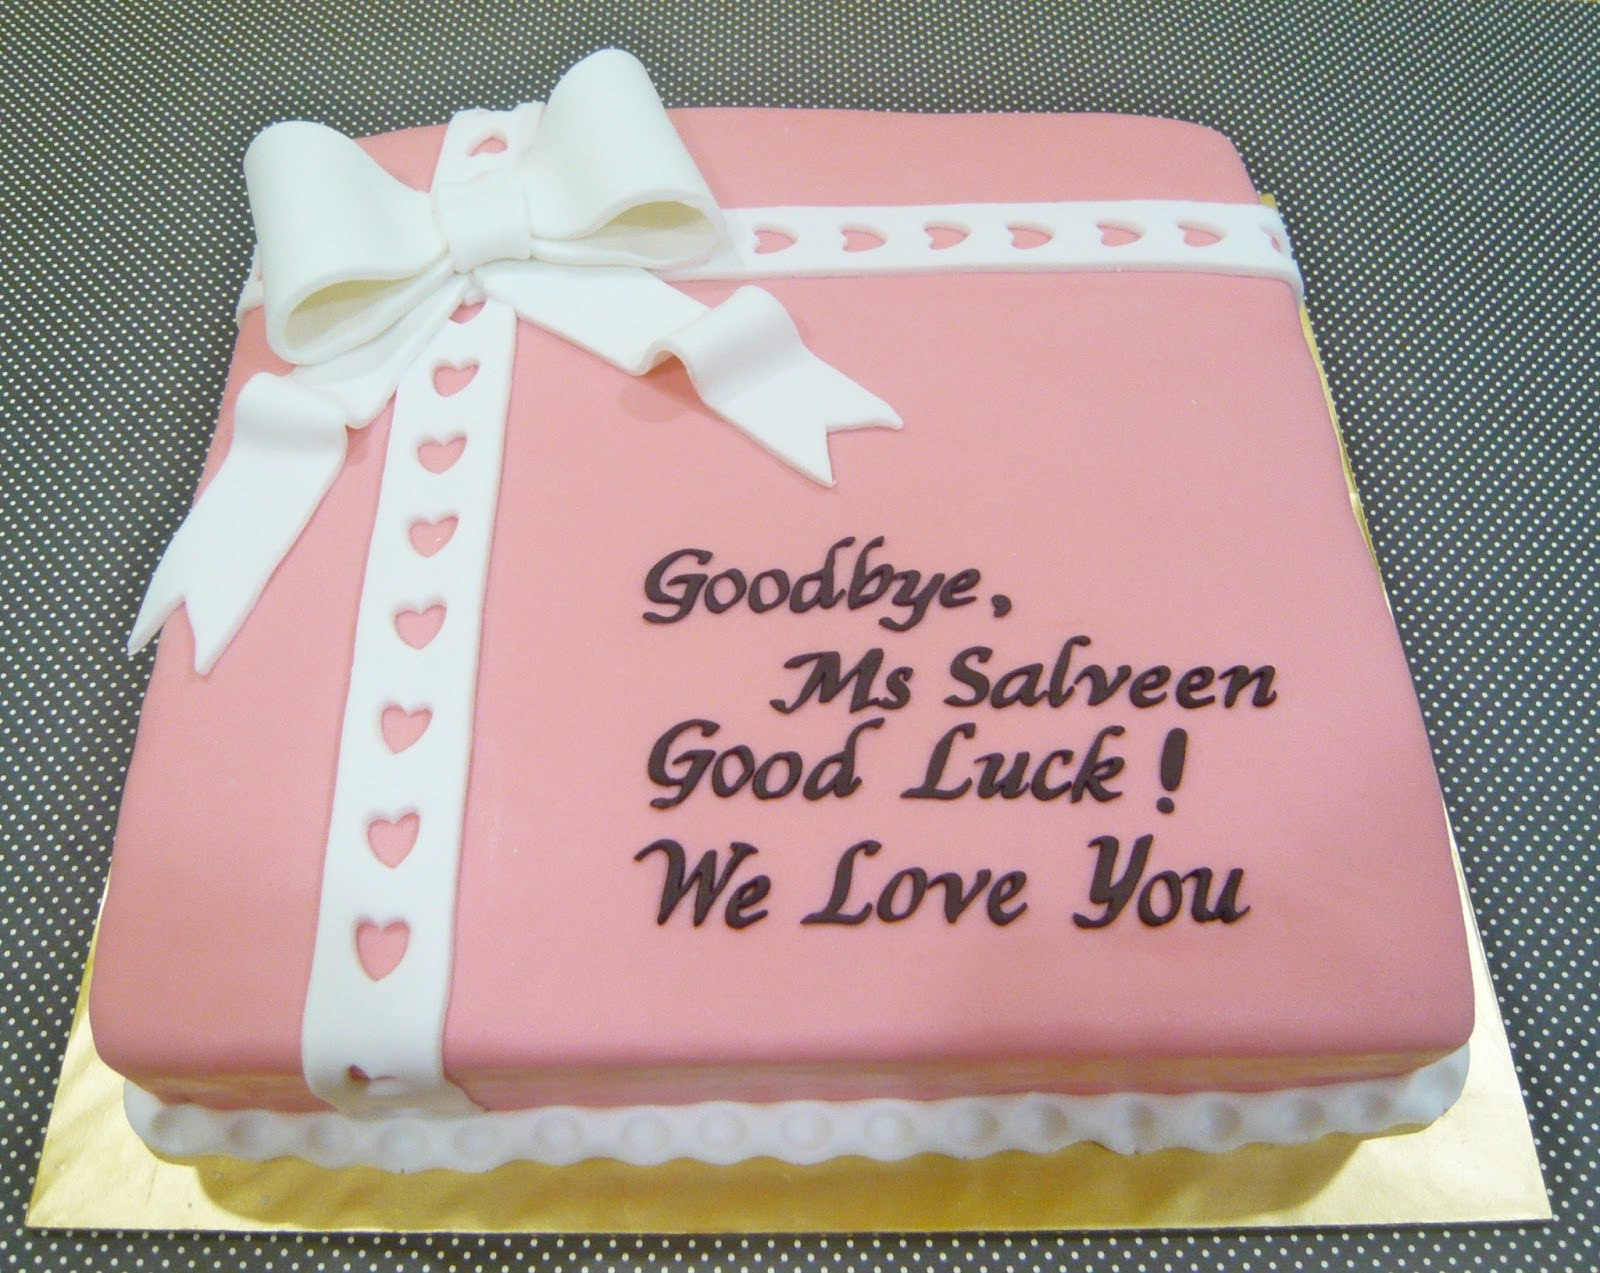 Farewell Cake Decorating Ideas